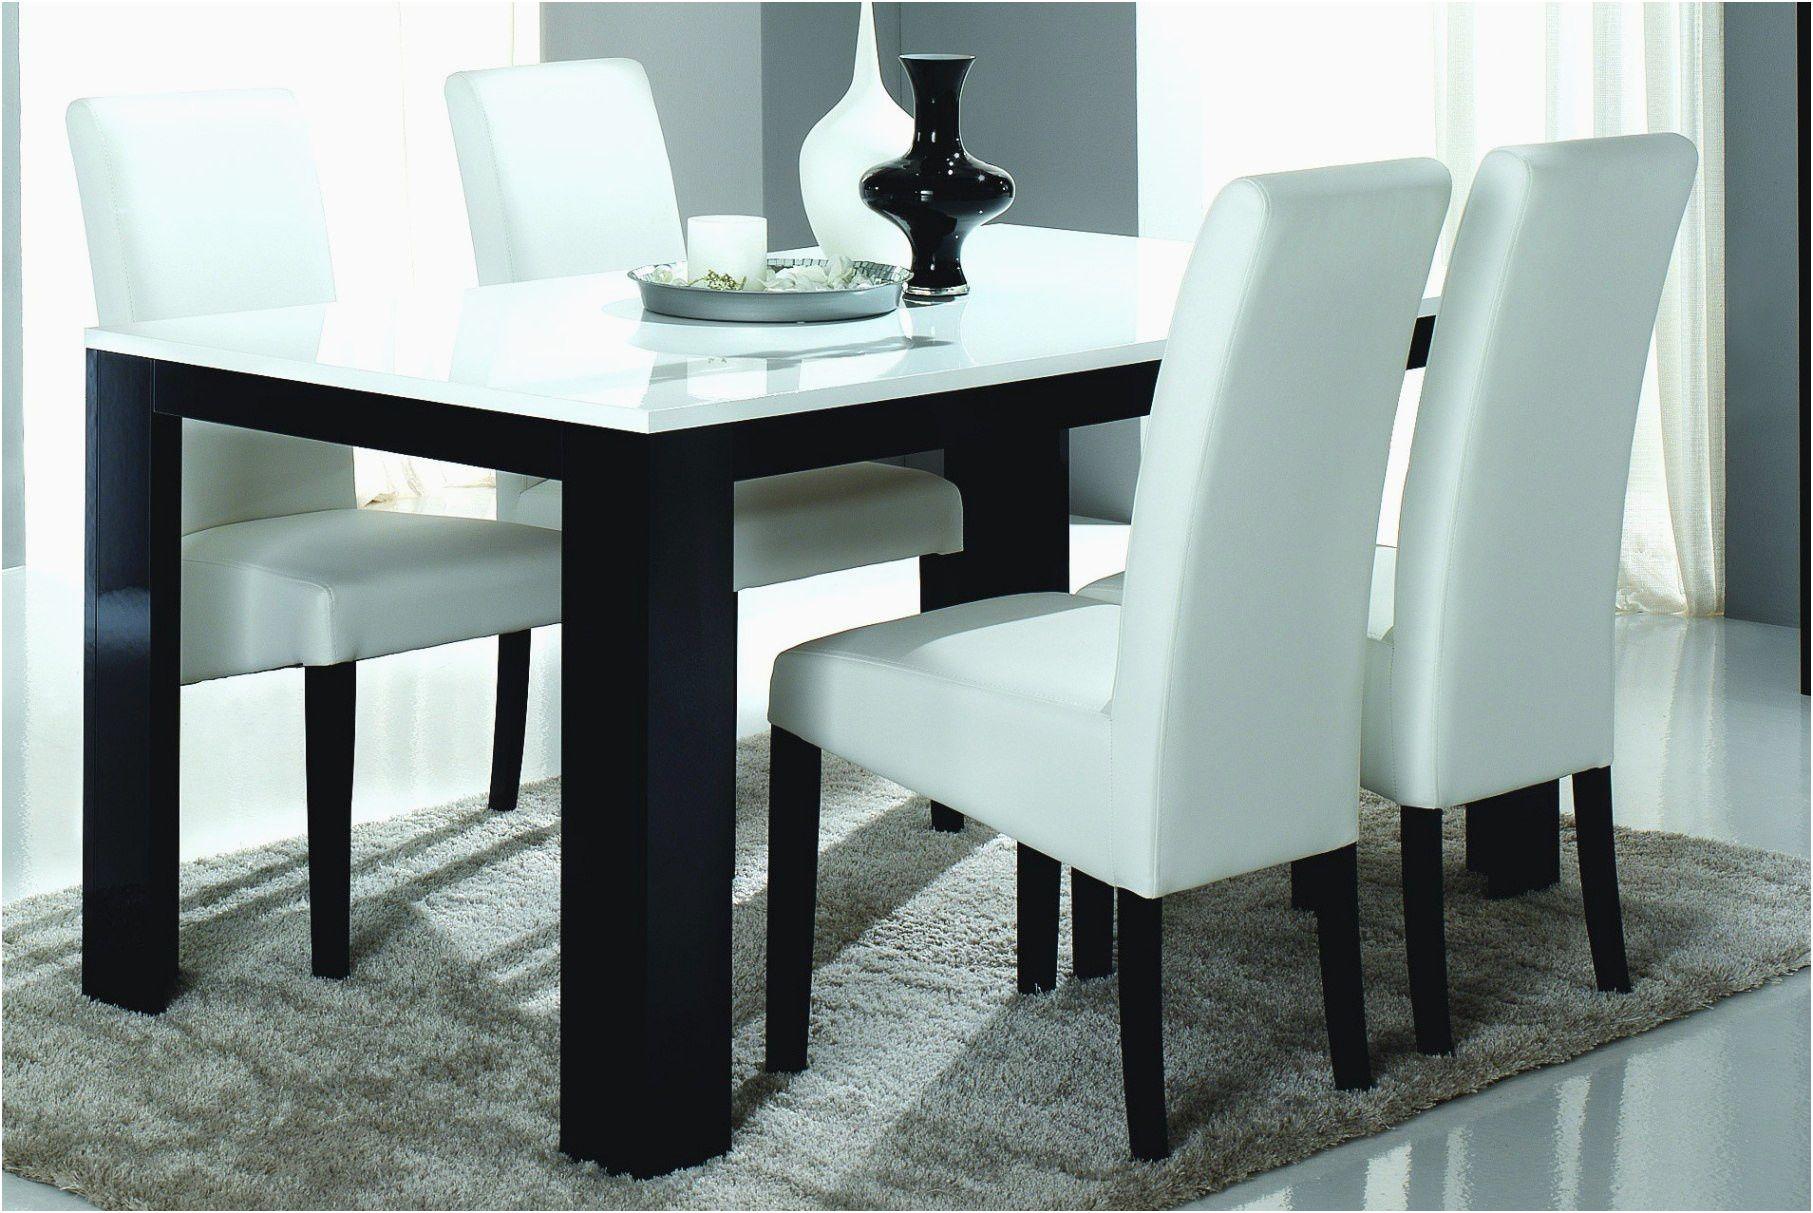 10 Amusant Table Carrée Extensible Ikea Photograph | Salle A ... serapportantà Table Basse De Jardin Ikea